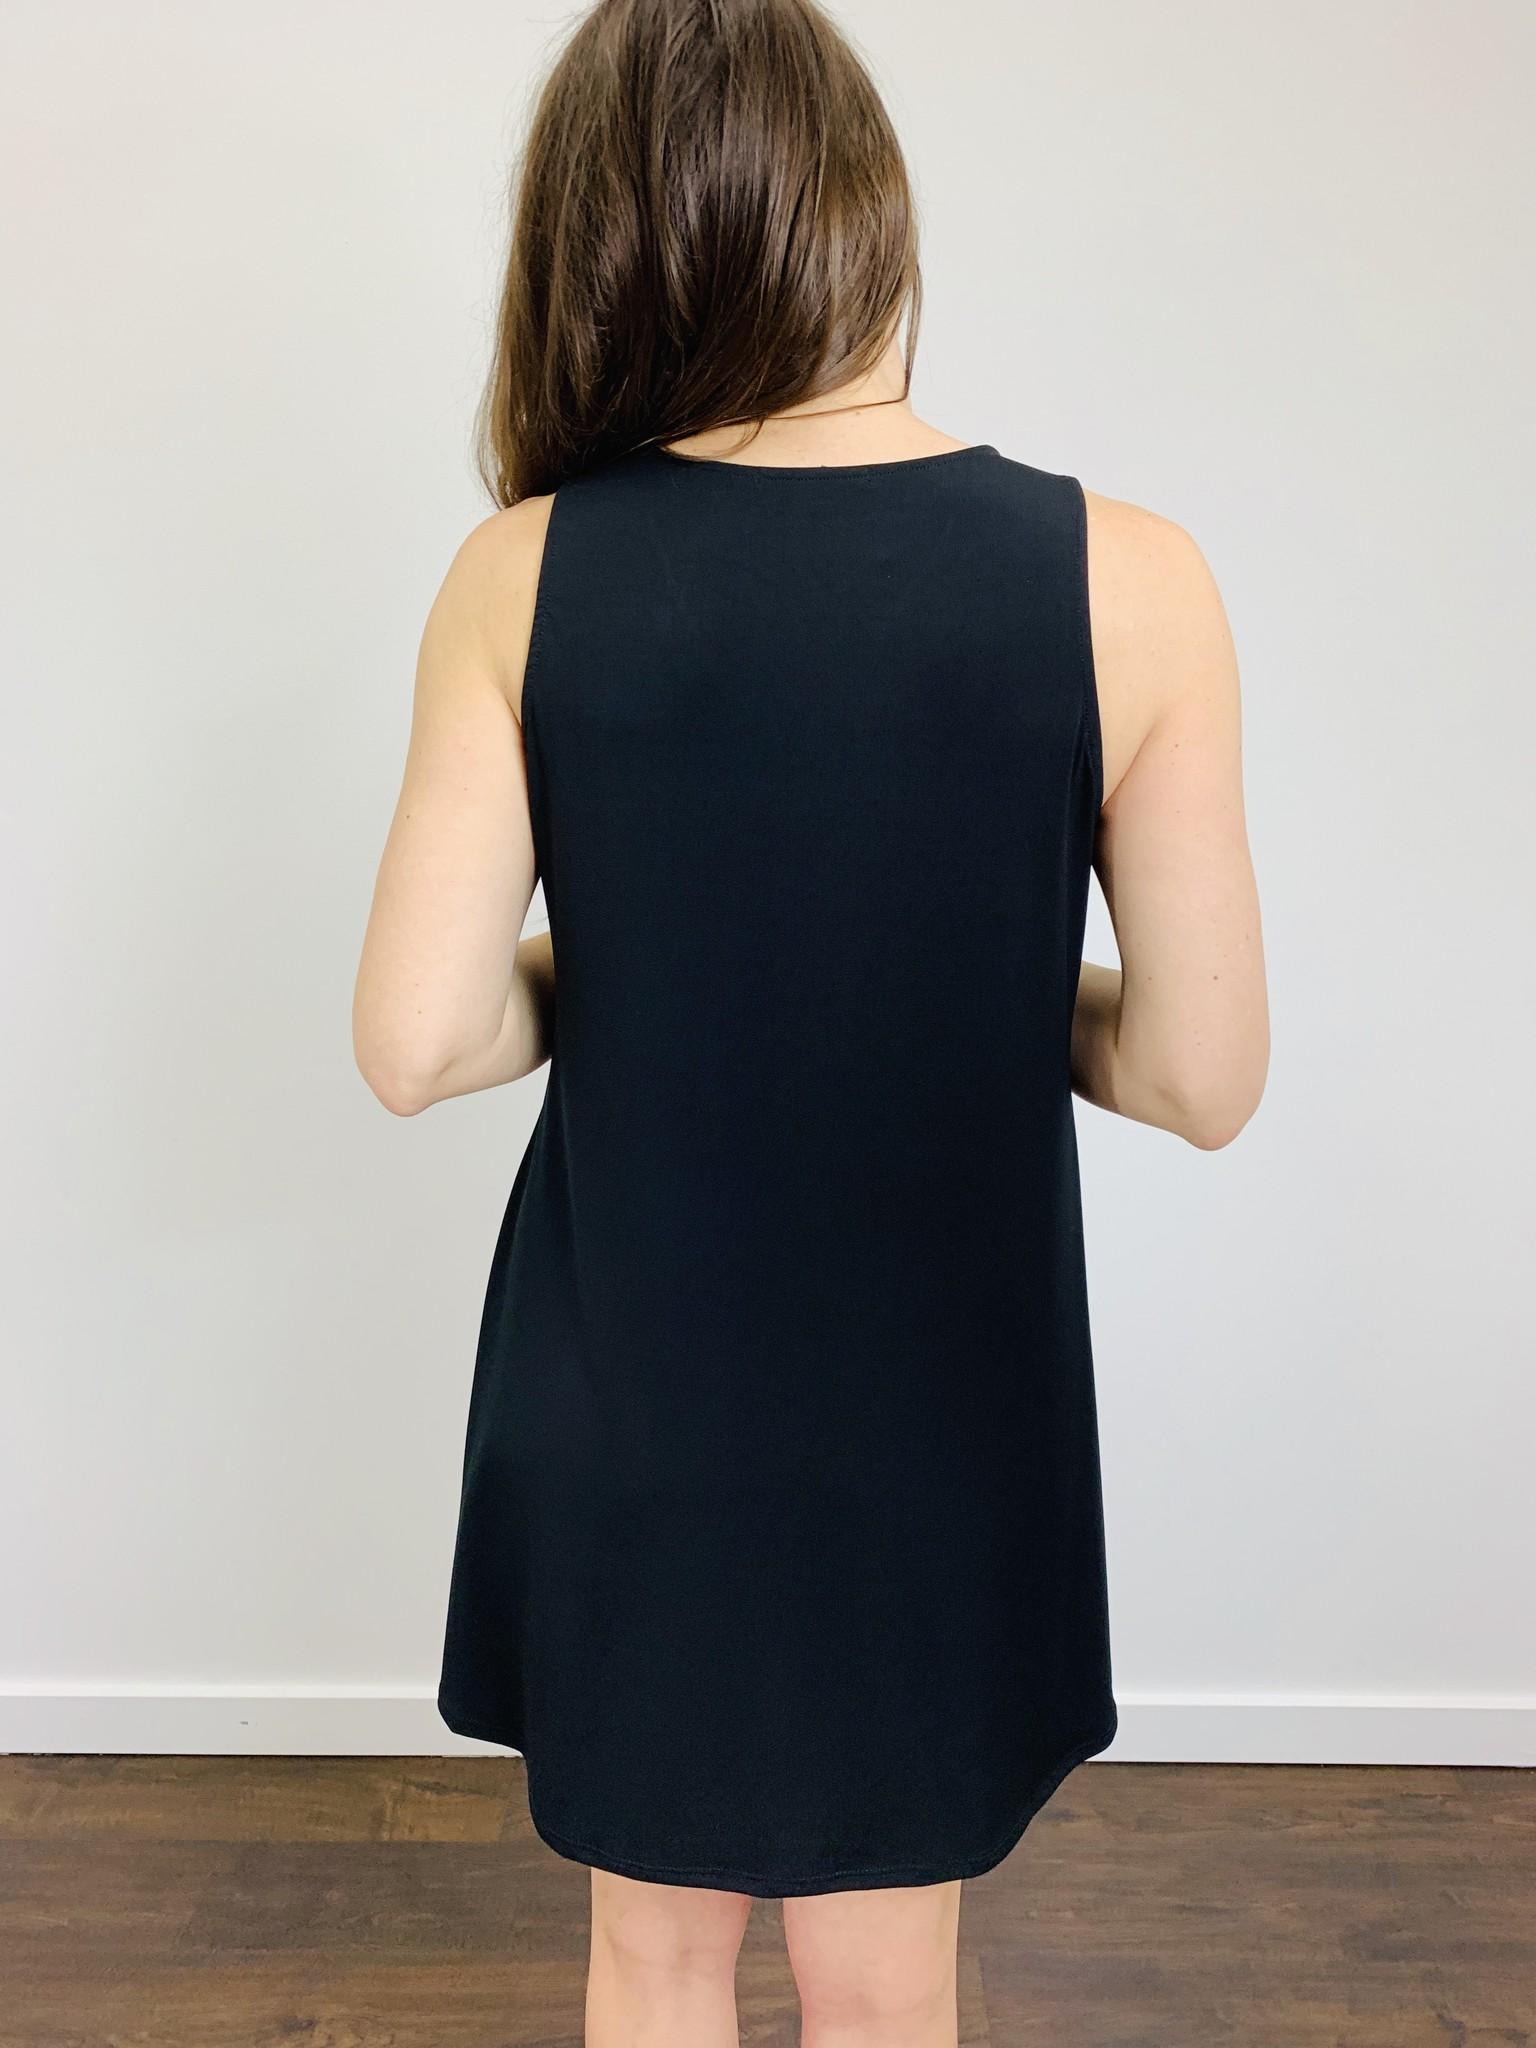 Ariella Big Zipper Dress